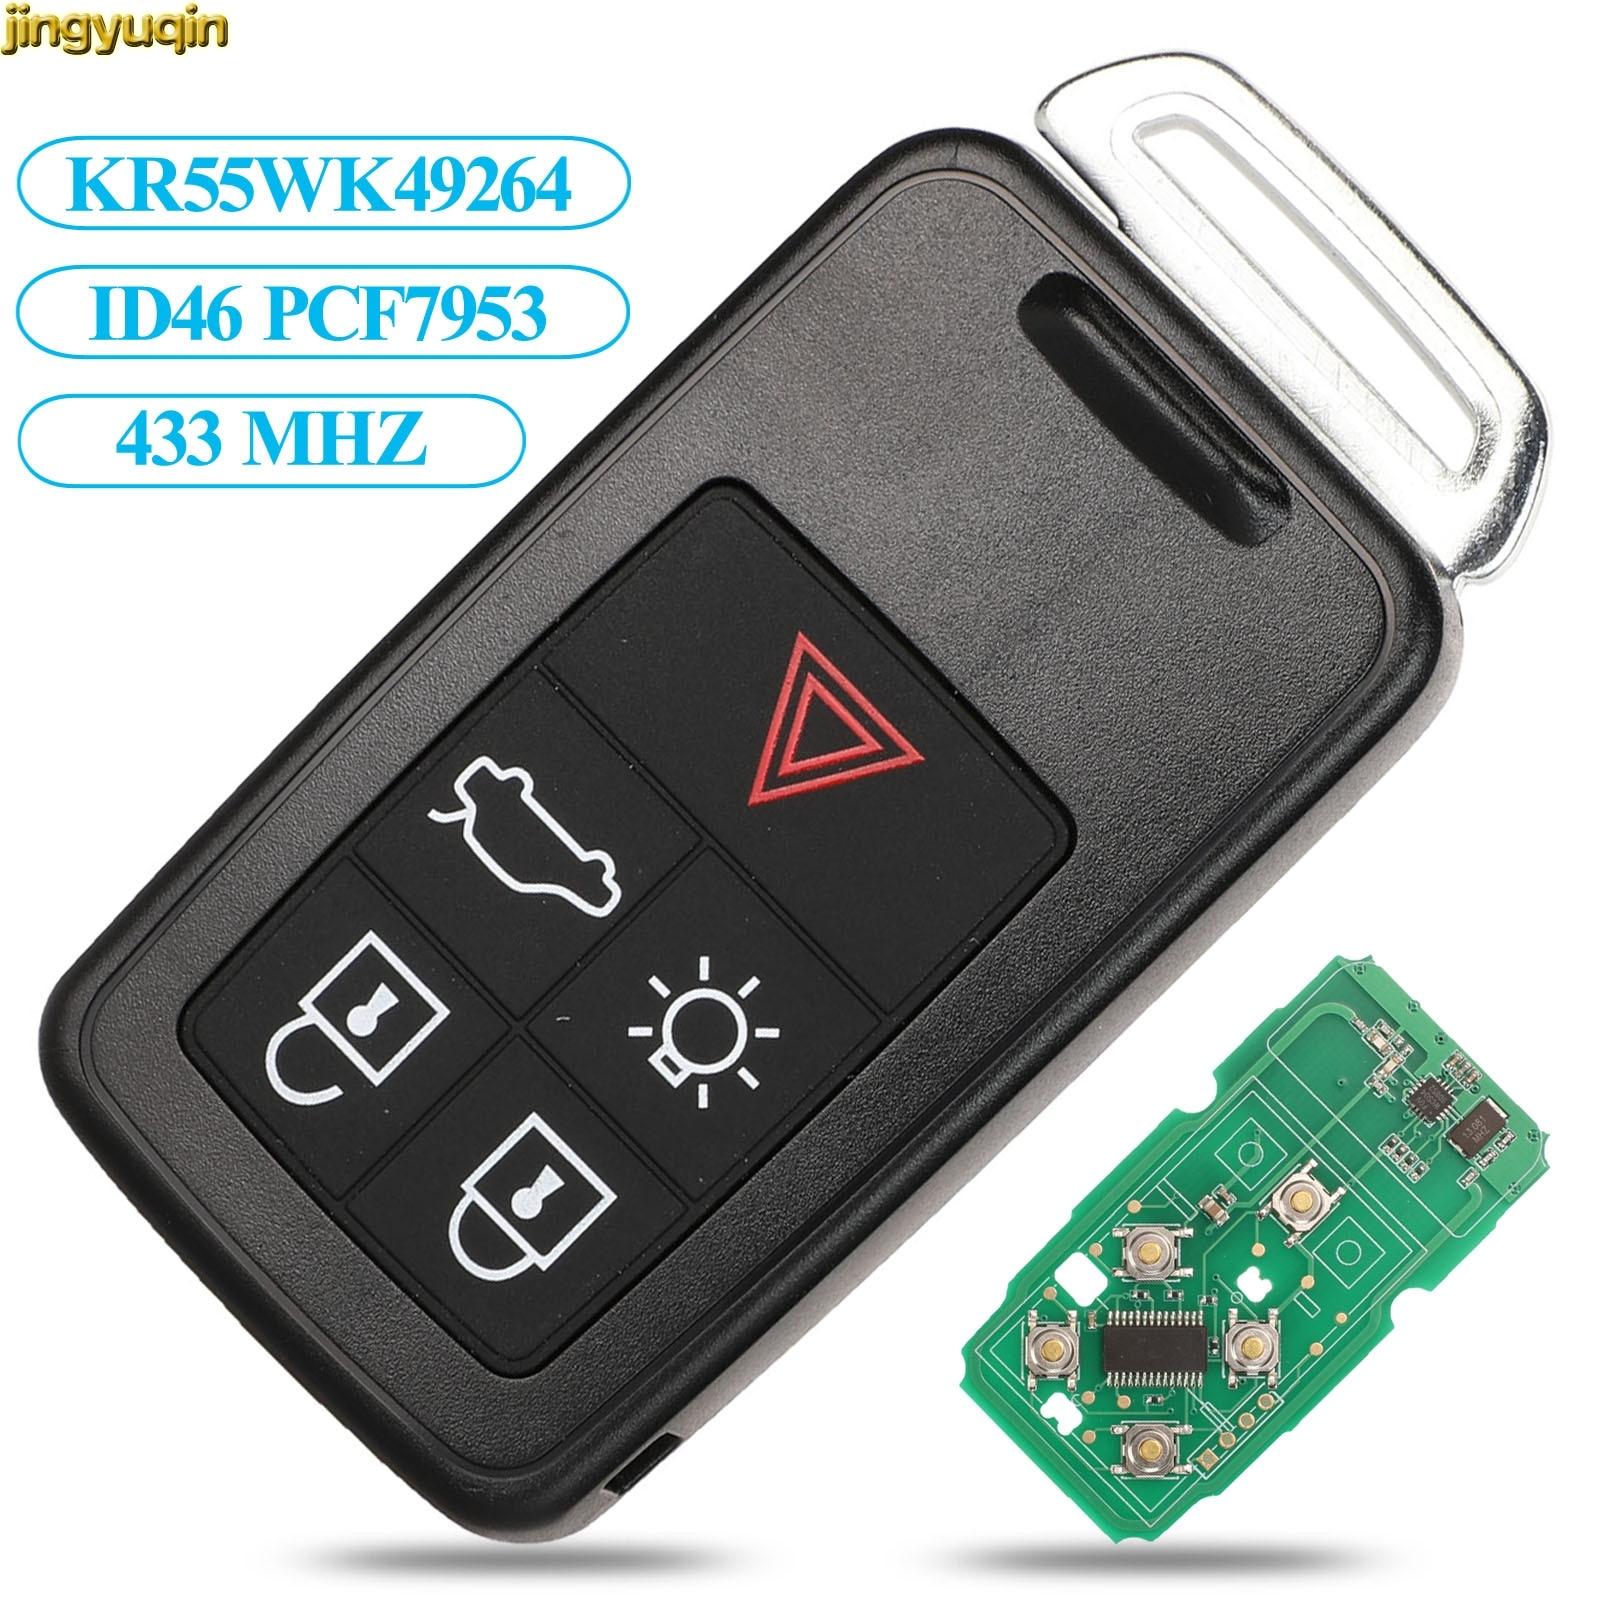 Jingyuqin Fernbedienung Auto Schlüssel 434Mhz ID46 Chip Für Volvo KYDZ S60 S60L S80 V40 V60 XC60 XC70 5 Taste smart Key